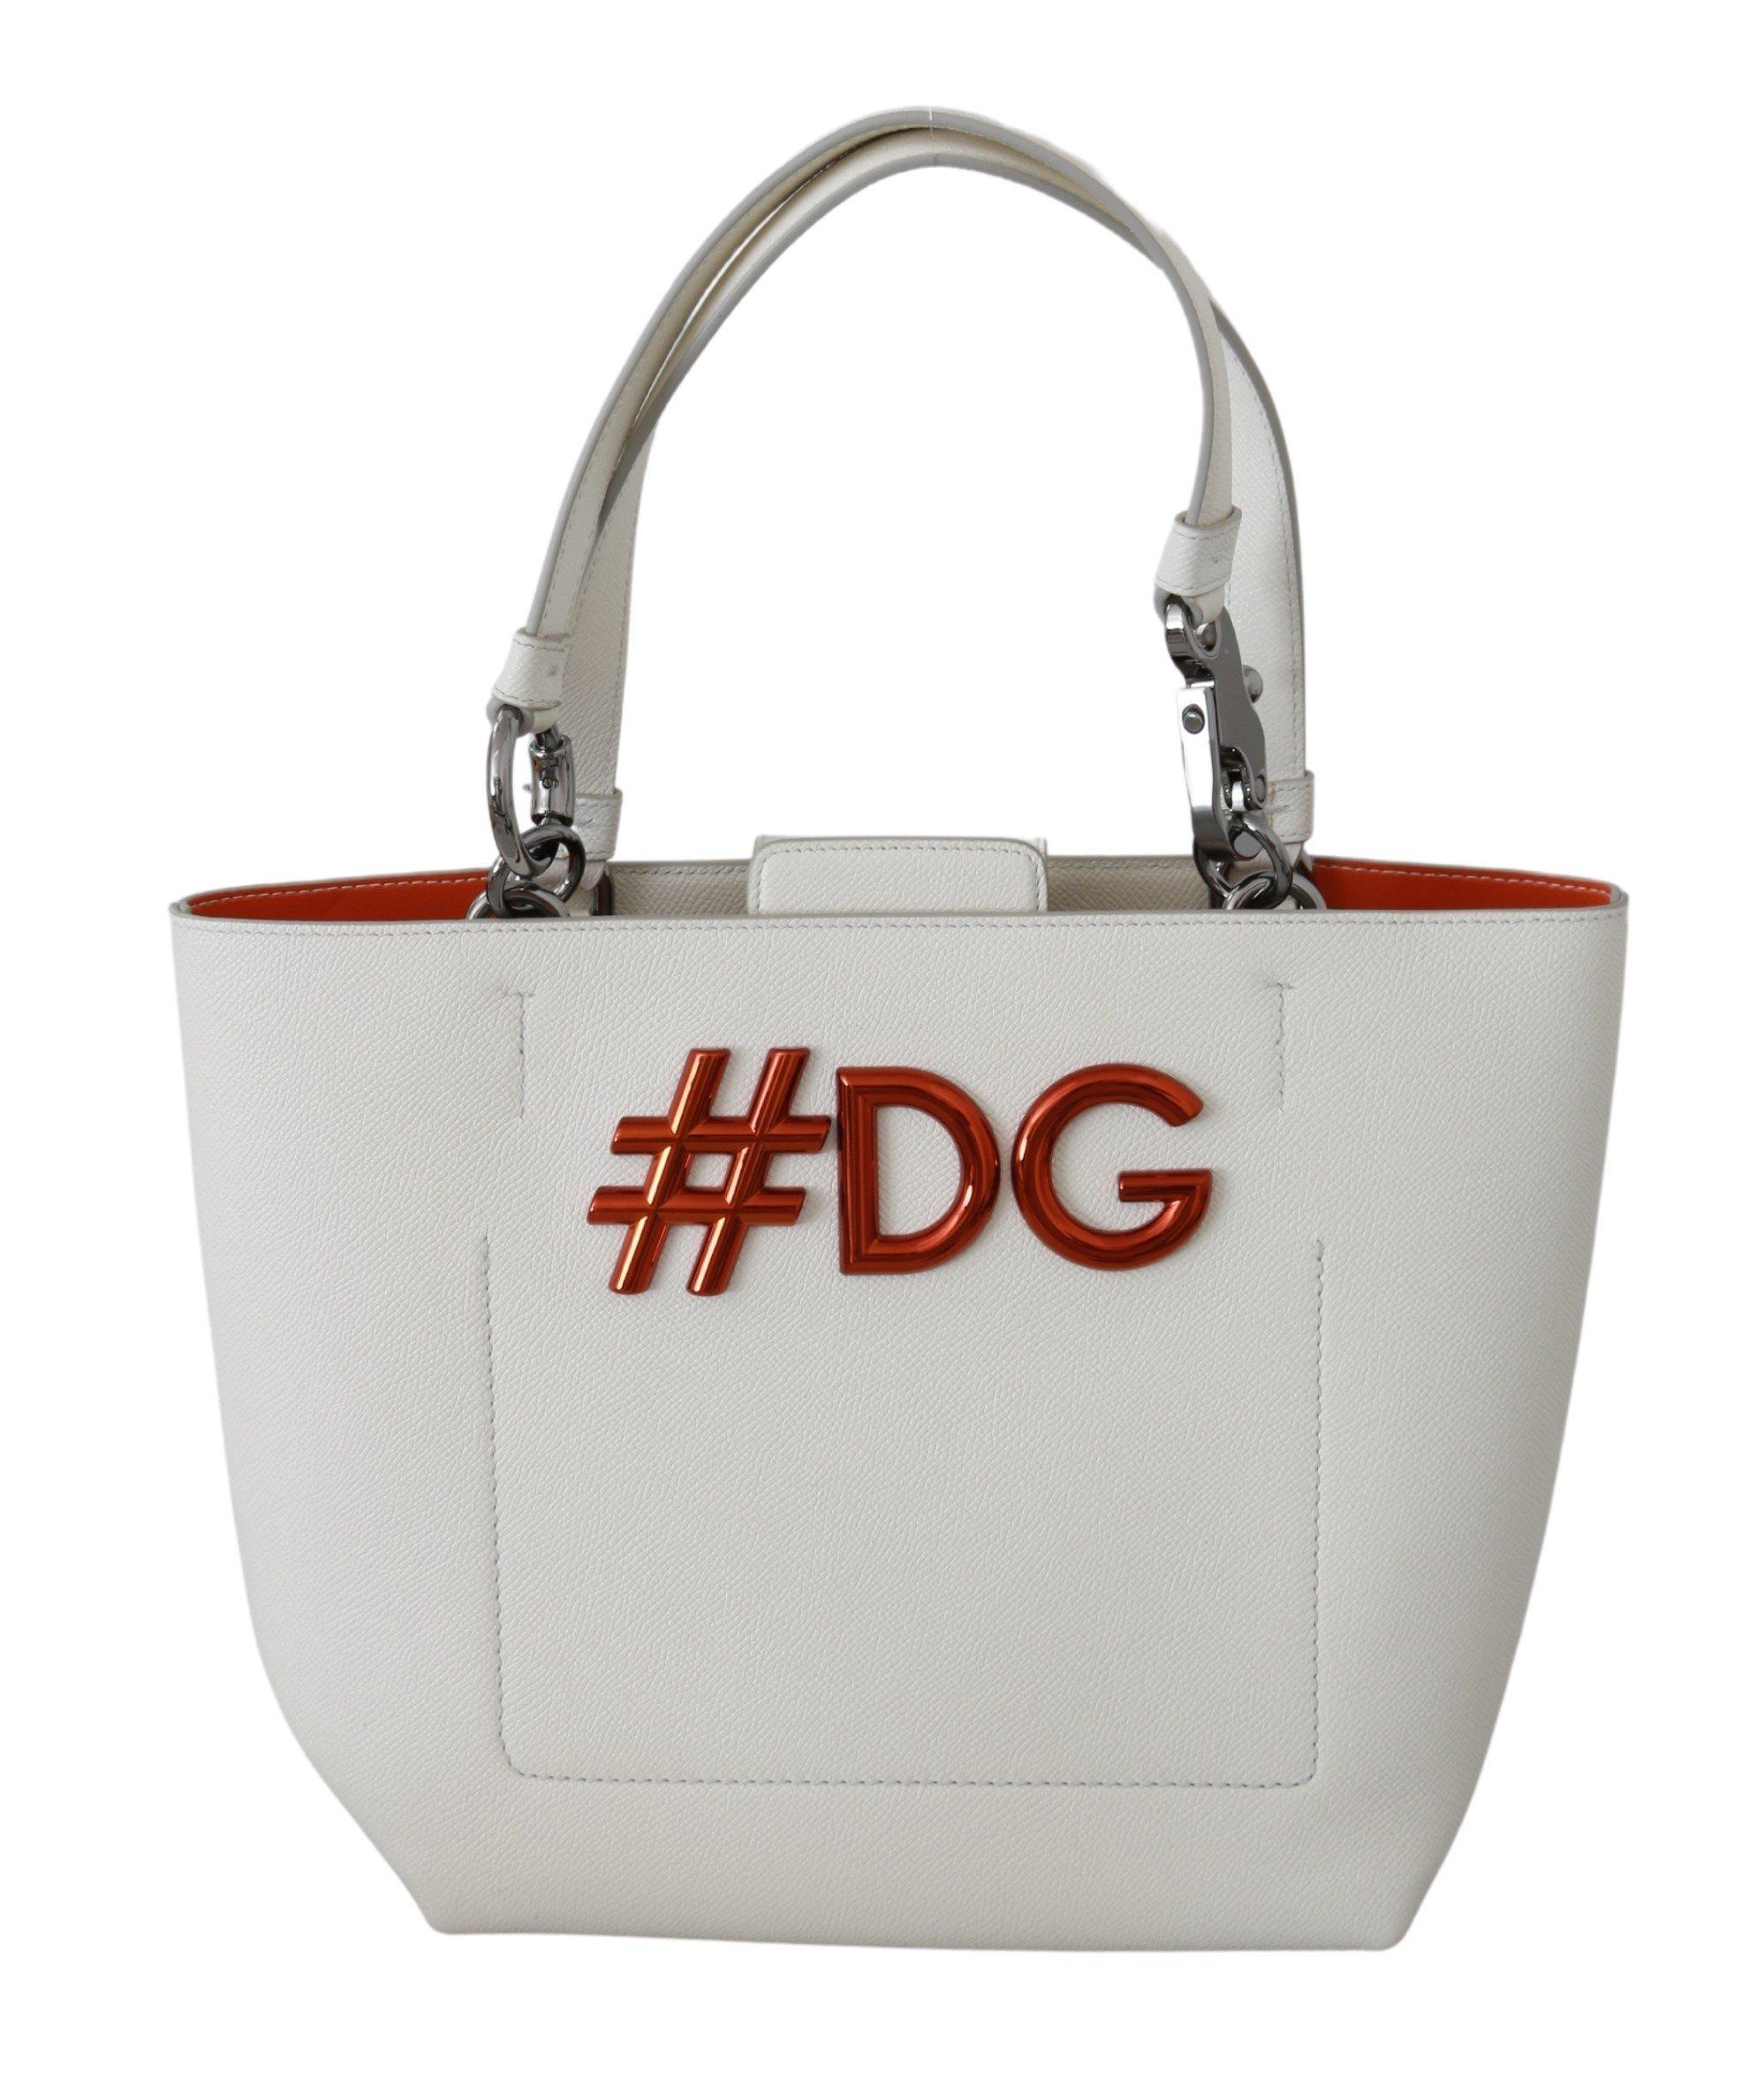 Dolce & Gabbana Women's Hand Leather BEATRICE Tote Bag White VAS9220